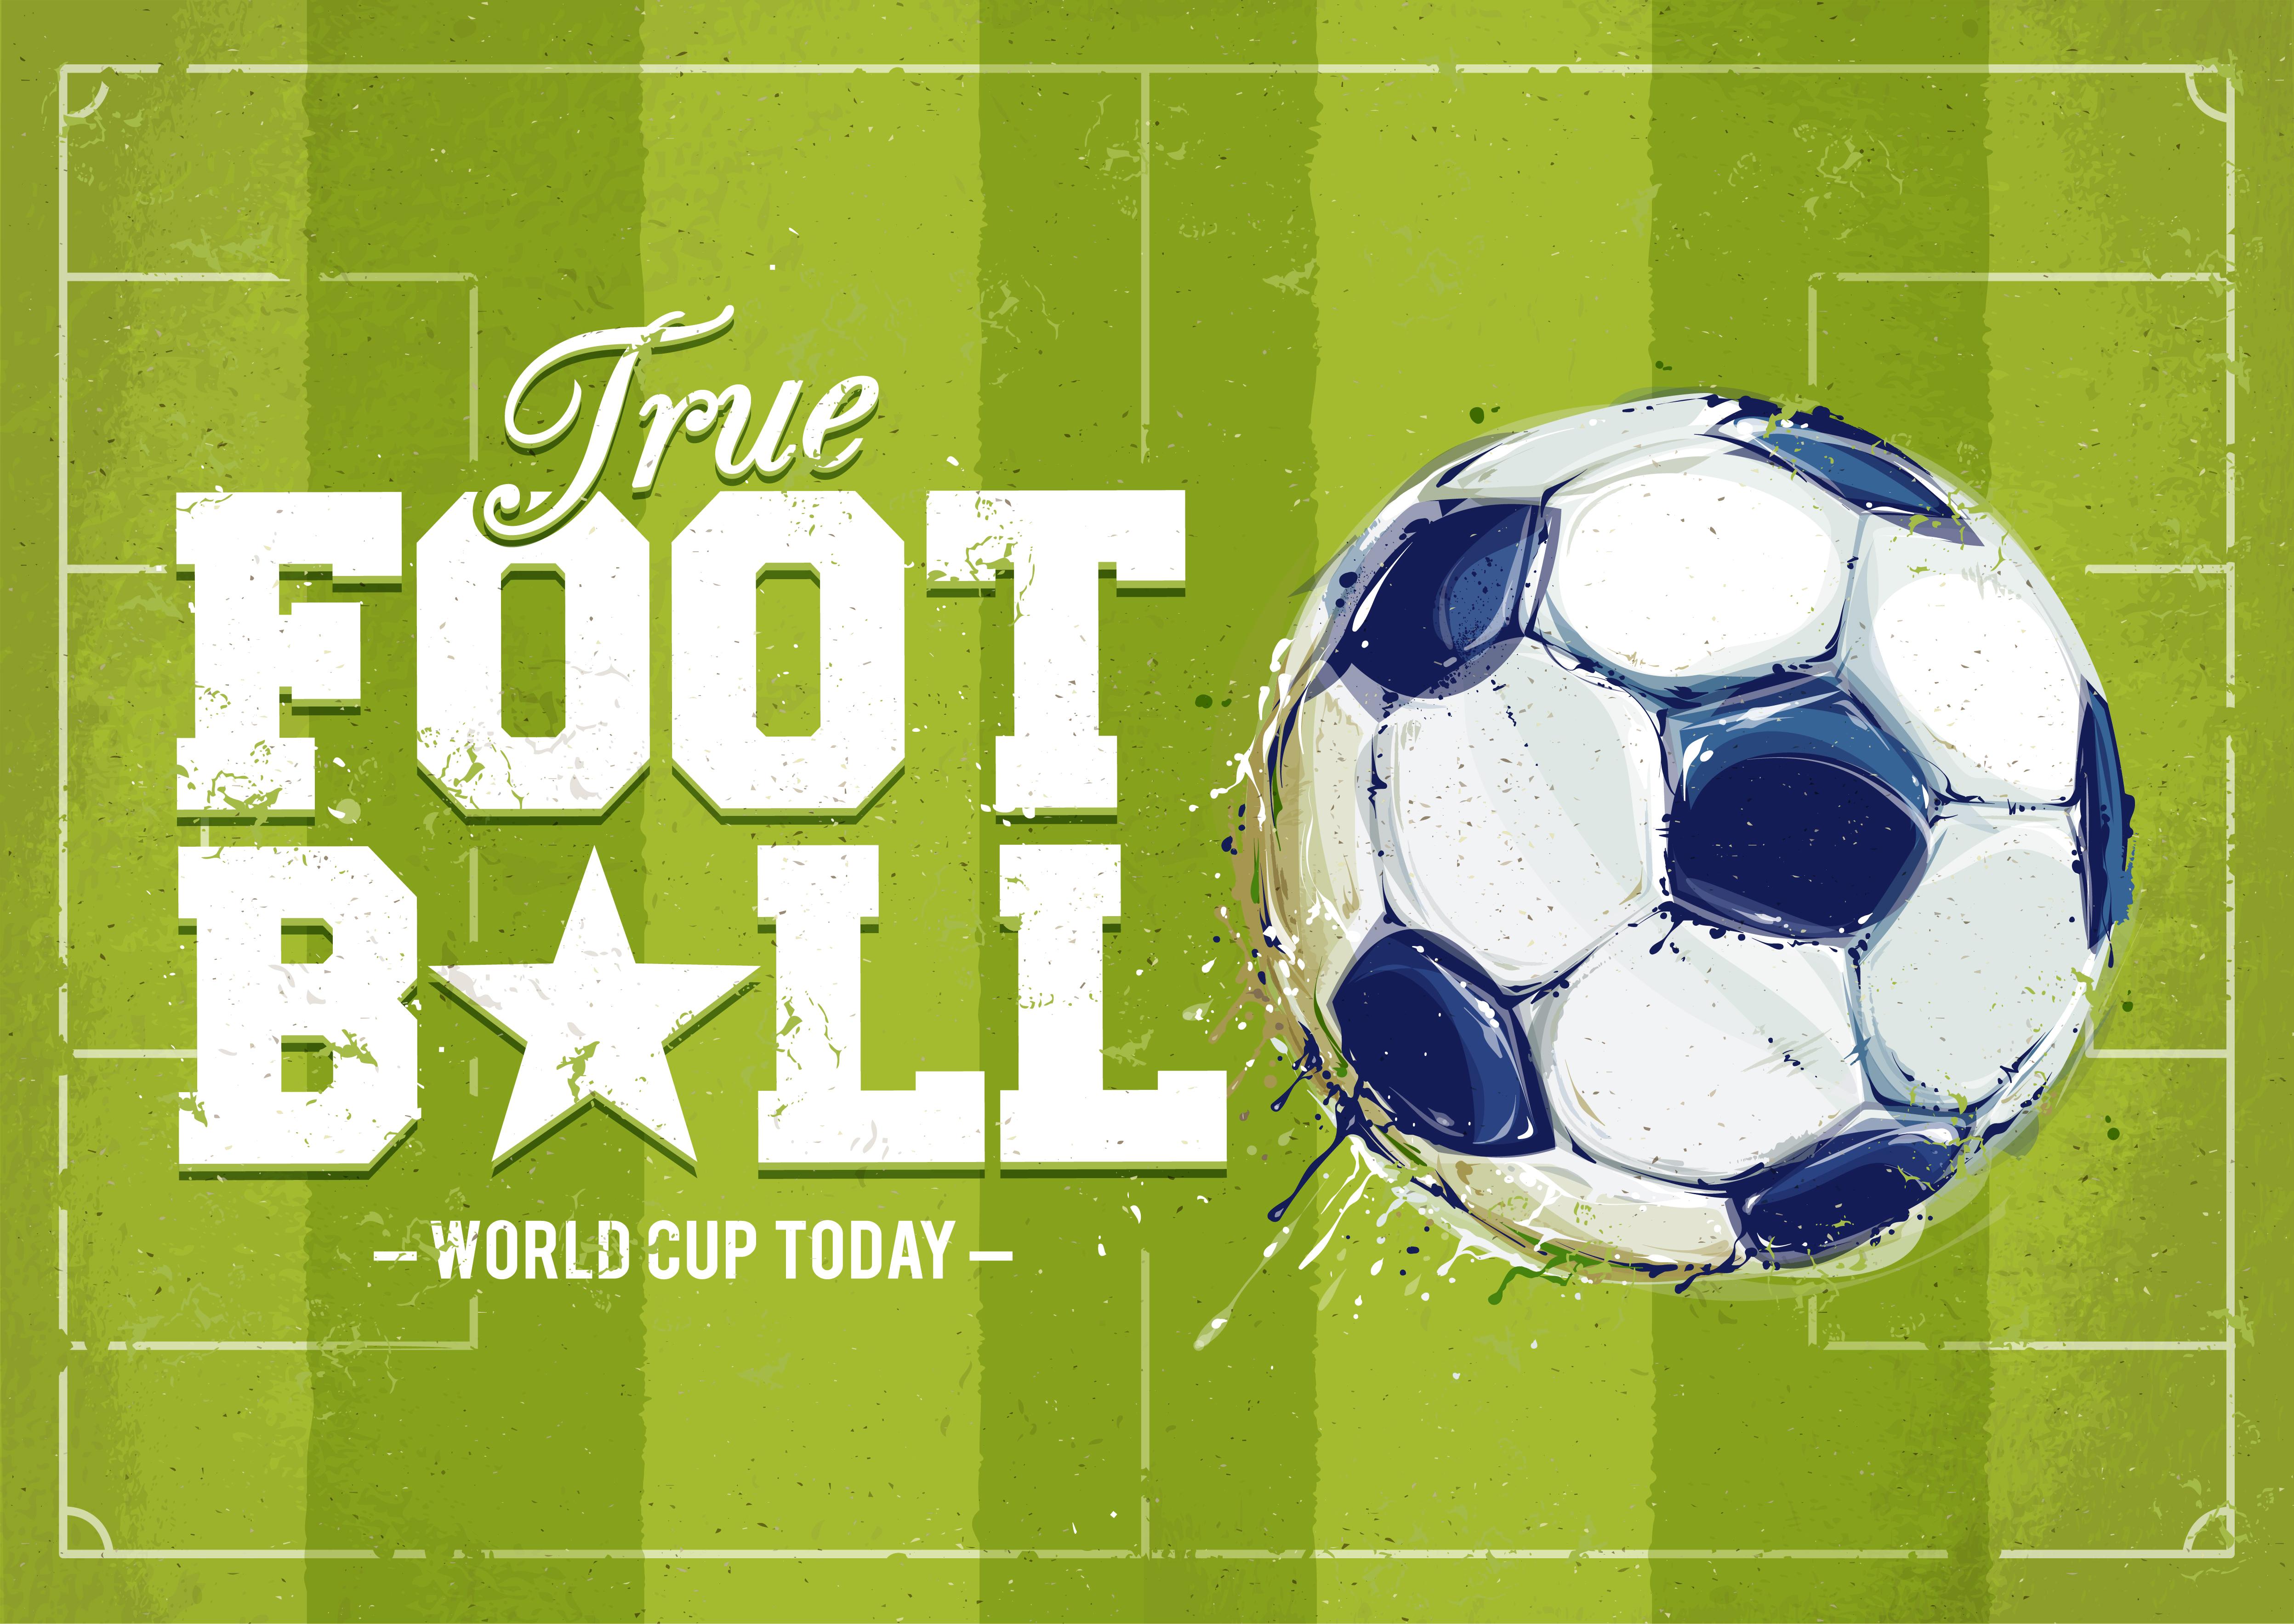 Deportes Pelotas Fondo Grunge: Cartel De Fútbol De Grunge